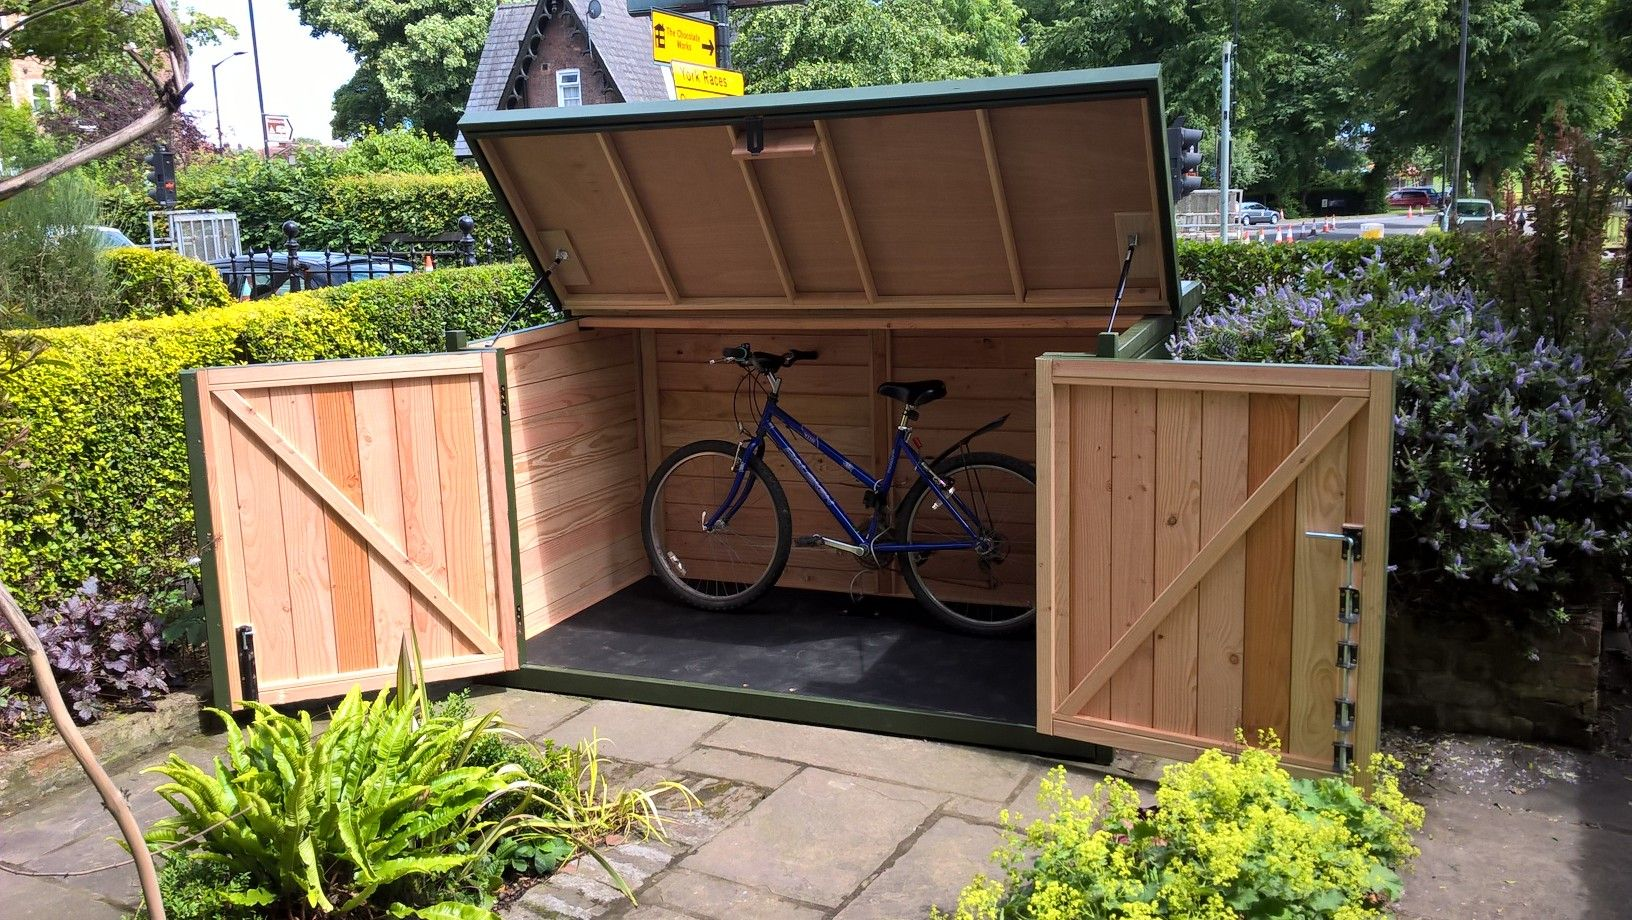 pin by a girl called fred on bin cupboard bike shed bike. Black Bedroom Furniture Sets. Home Design Ideas